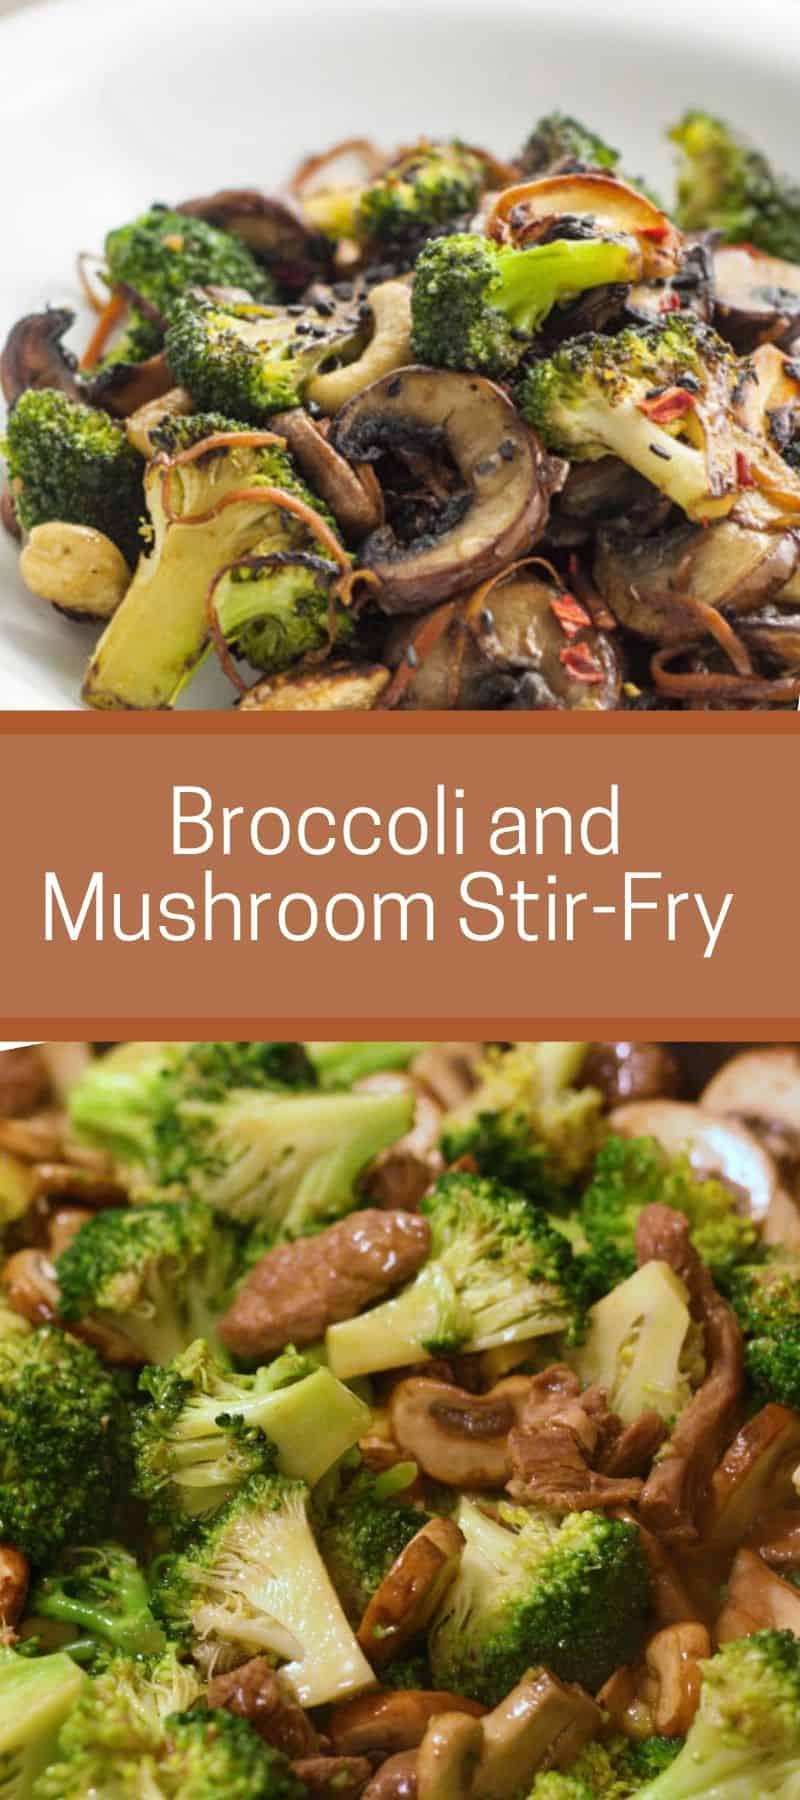 Broccoli and Mushroom Stir-Fry Recipe 3